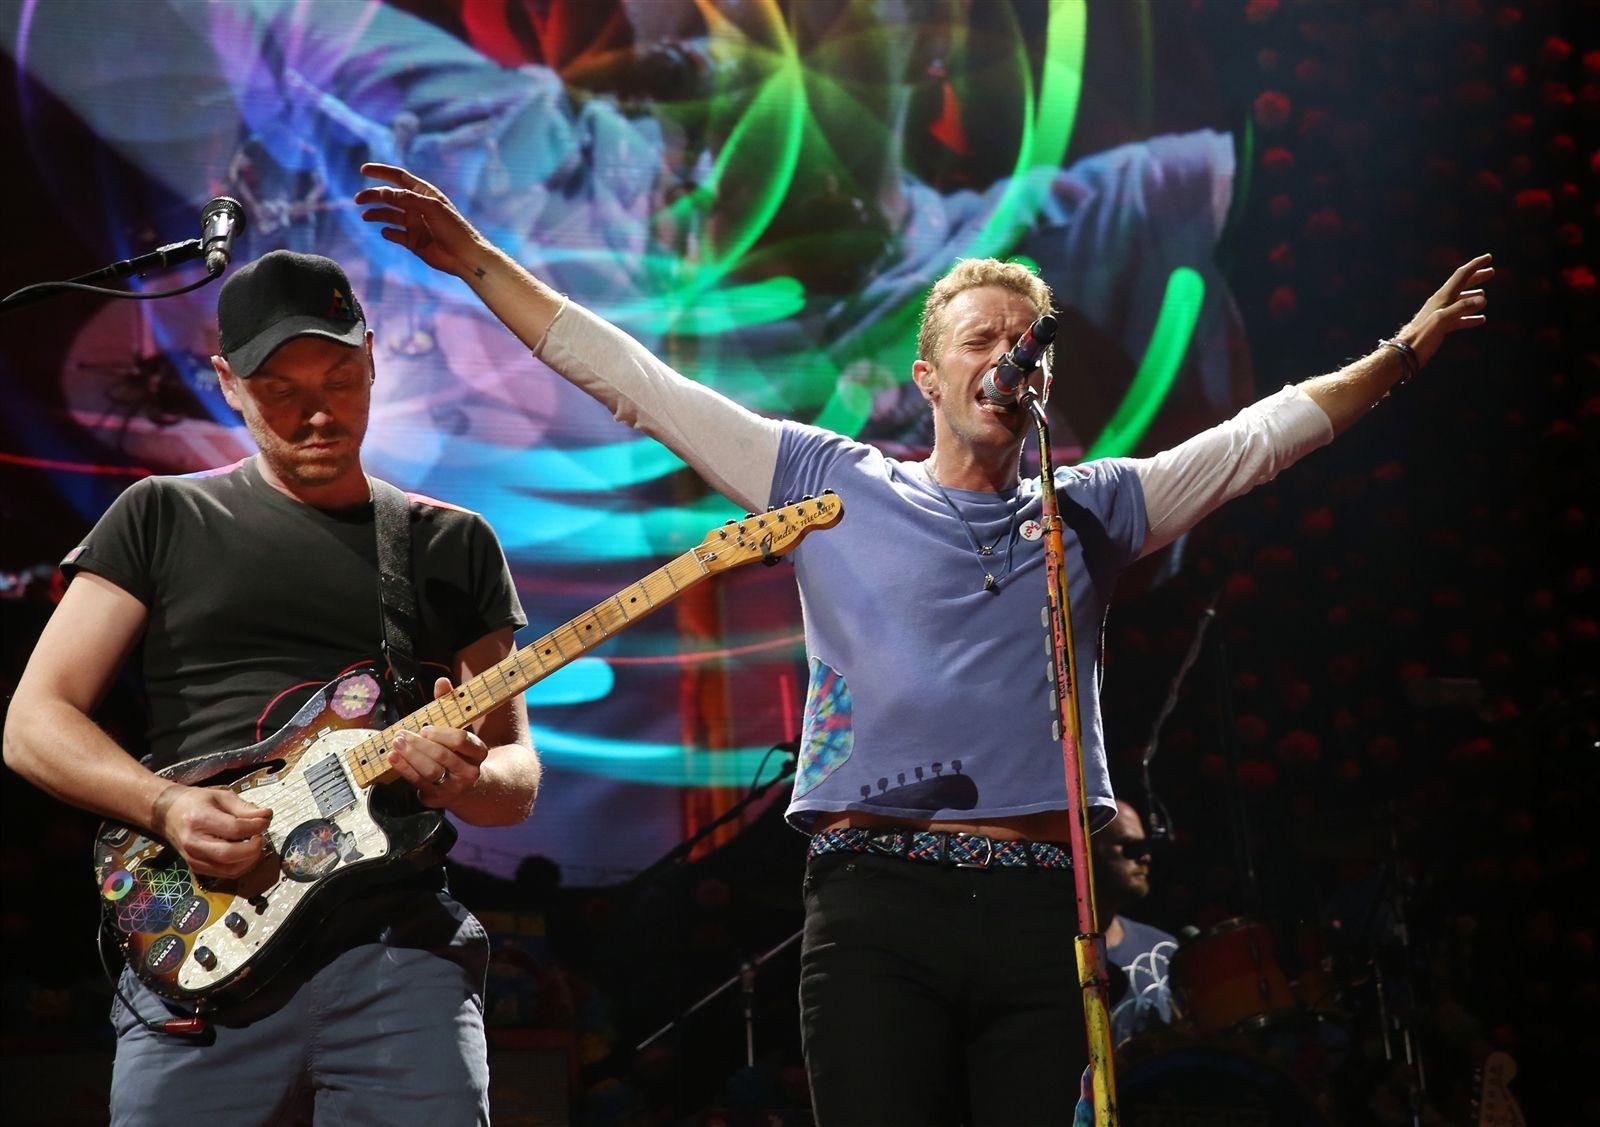 Band co-founders Jonny Buckland and Chris Martin.